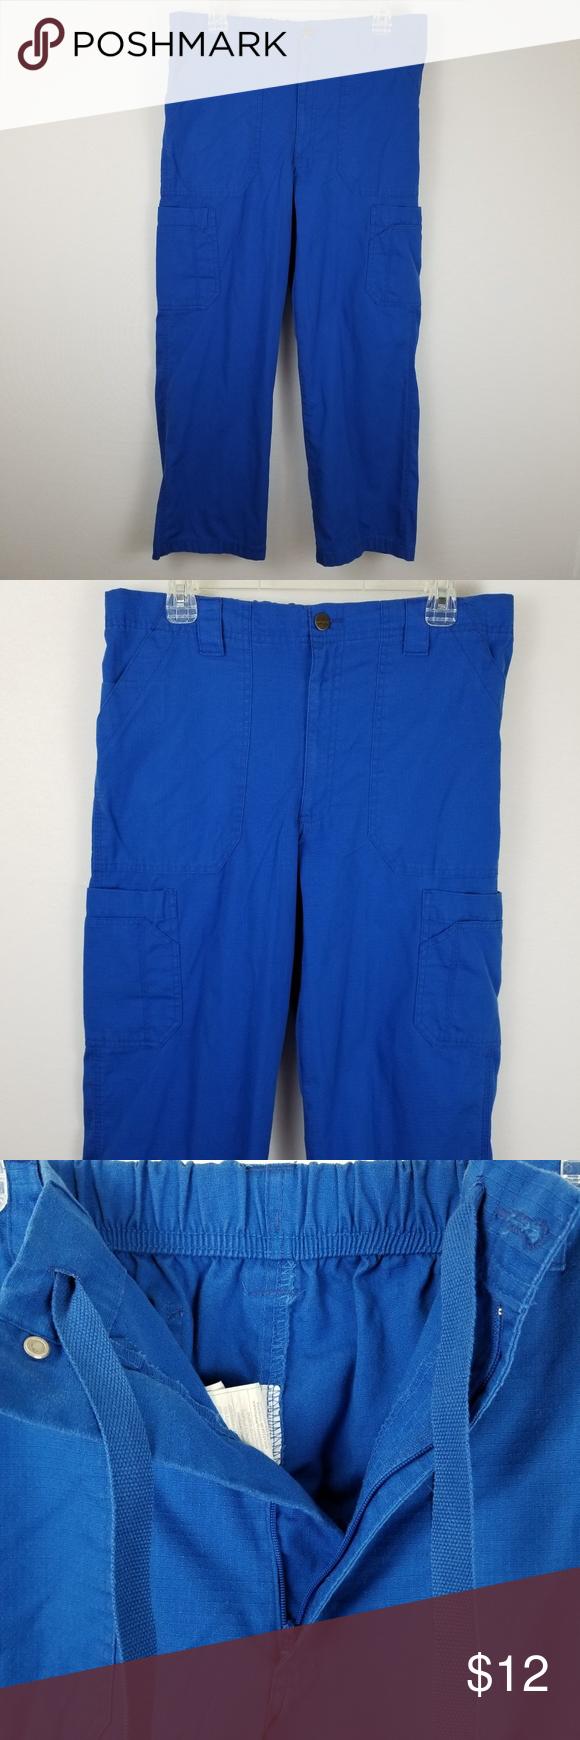 5b7c90dd5ee Mens Carhartt Scrub Pants C54108 Royal No stains, no holes. Ripstop  Multi-cargo